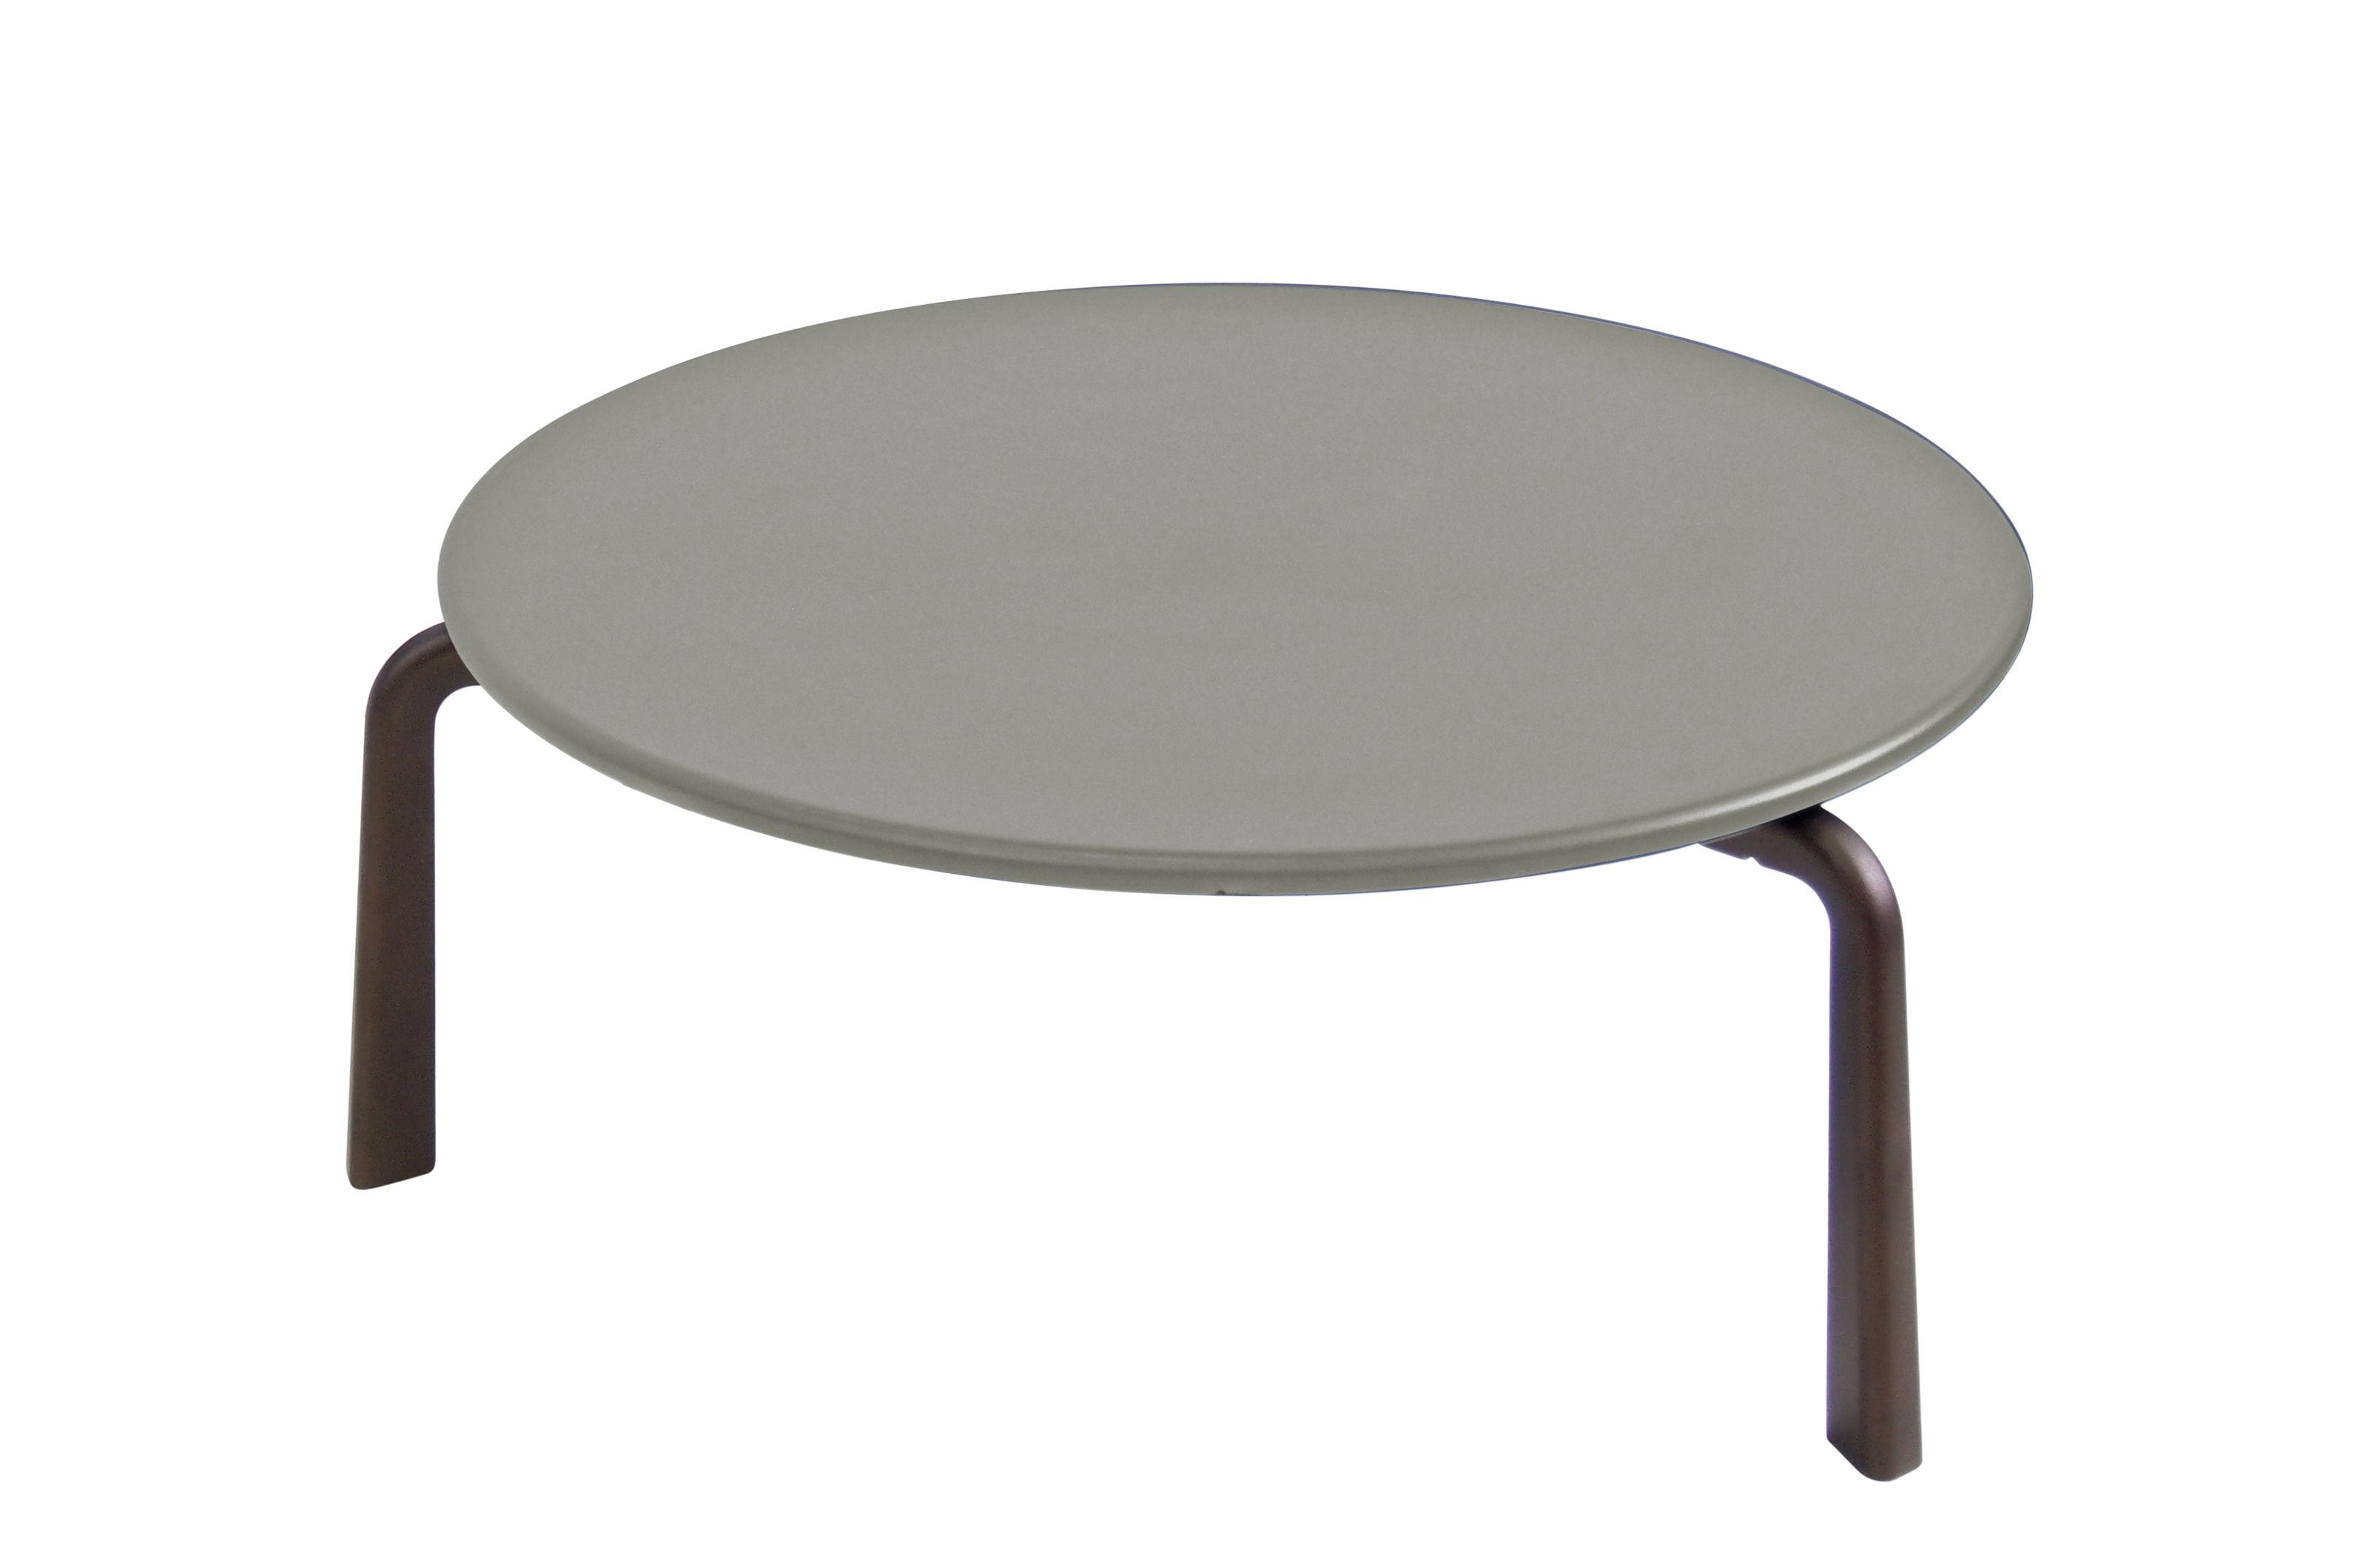 Table Basse Cross Small O 70 Cm Metal Emu